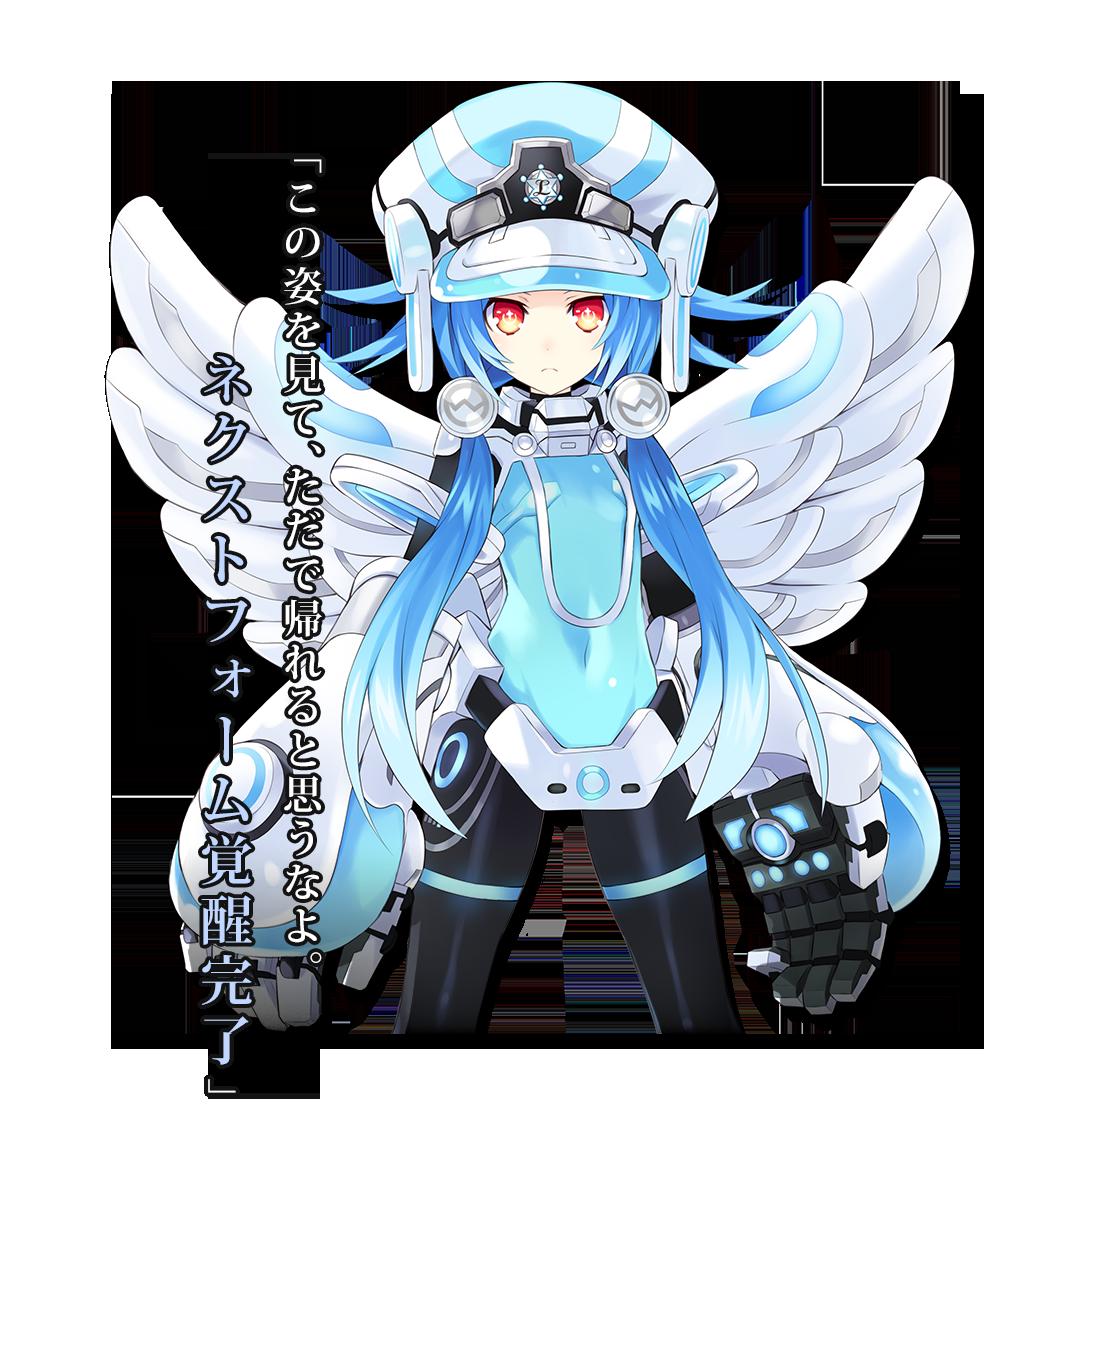 Hyperdimension Neptunia Victory II - CPU Goddess 'NEXT ...